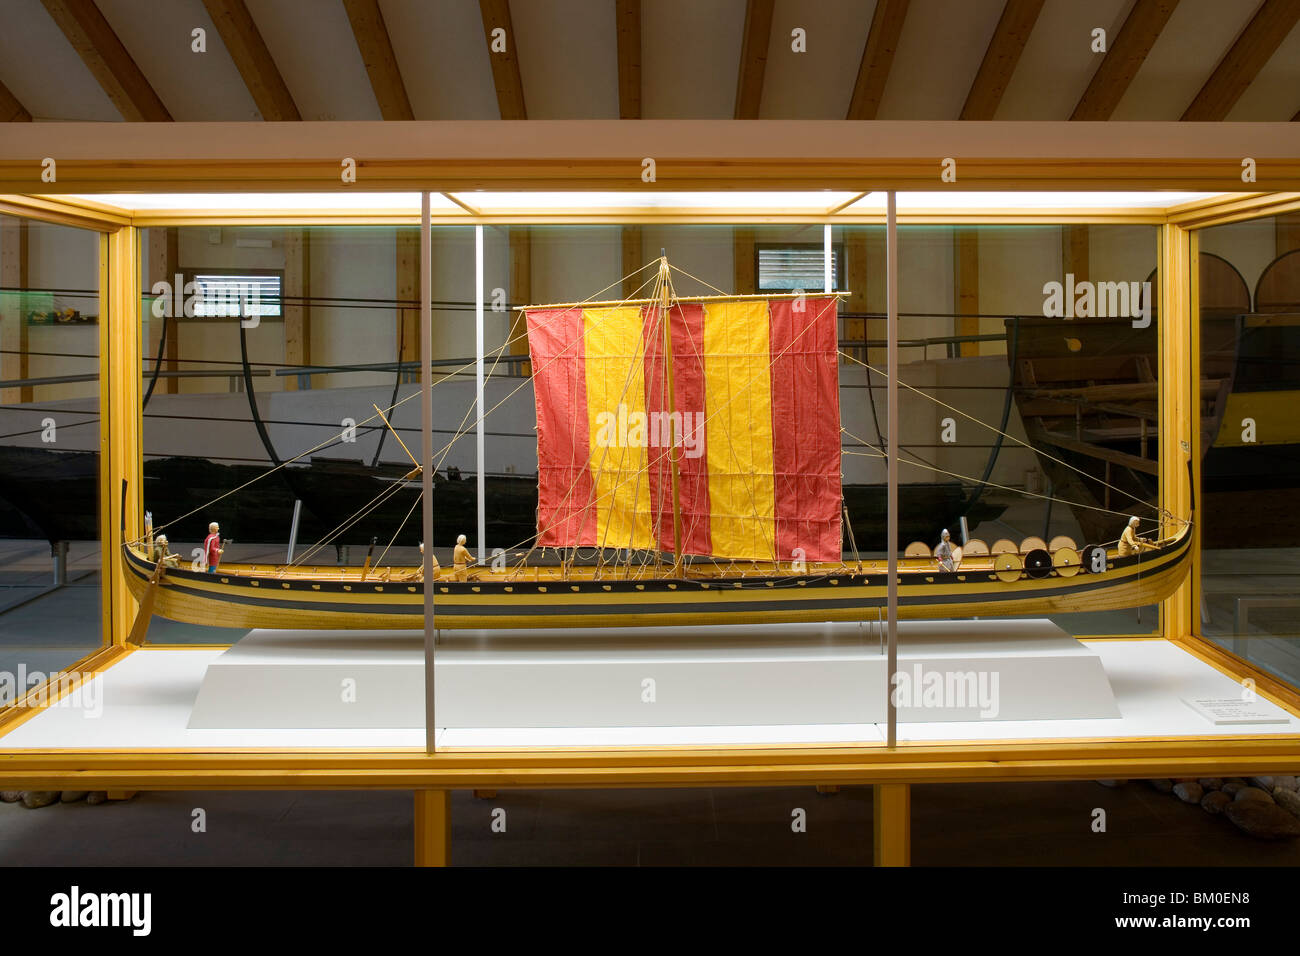 Model of a long-boat in the viking Museum Haithabu, near Schleswig, Schleswig-Holstein, Germany, Europe - Stock Image